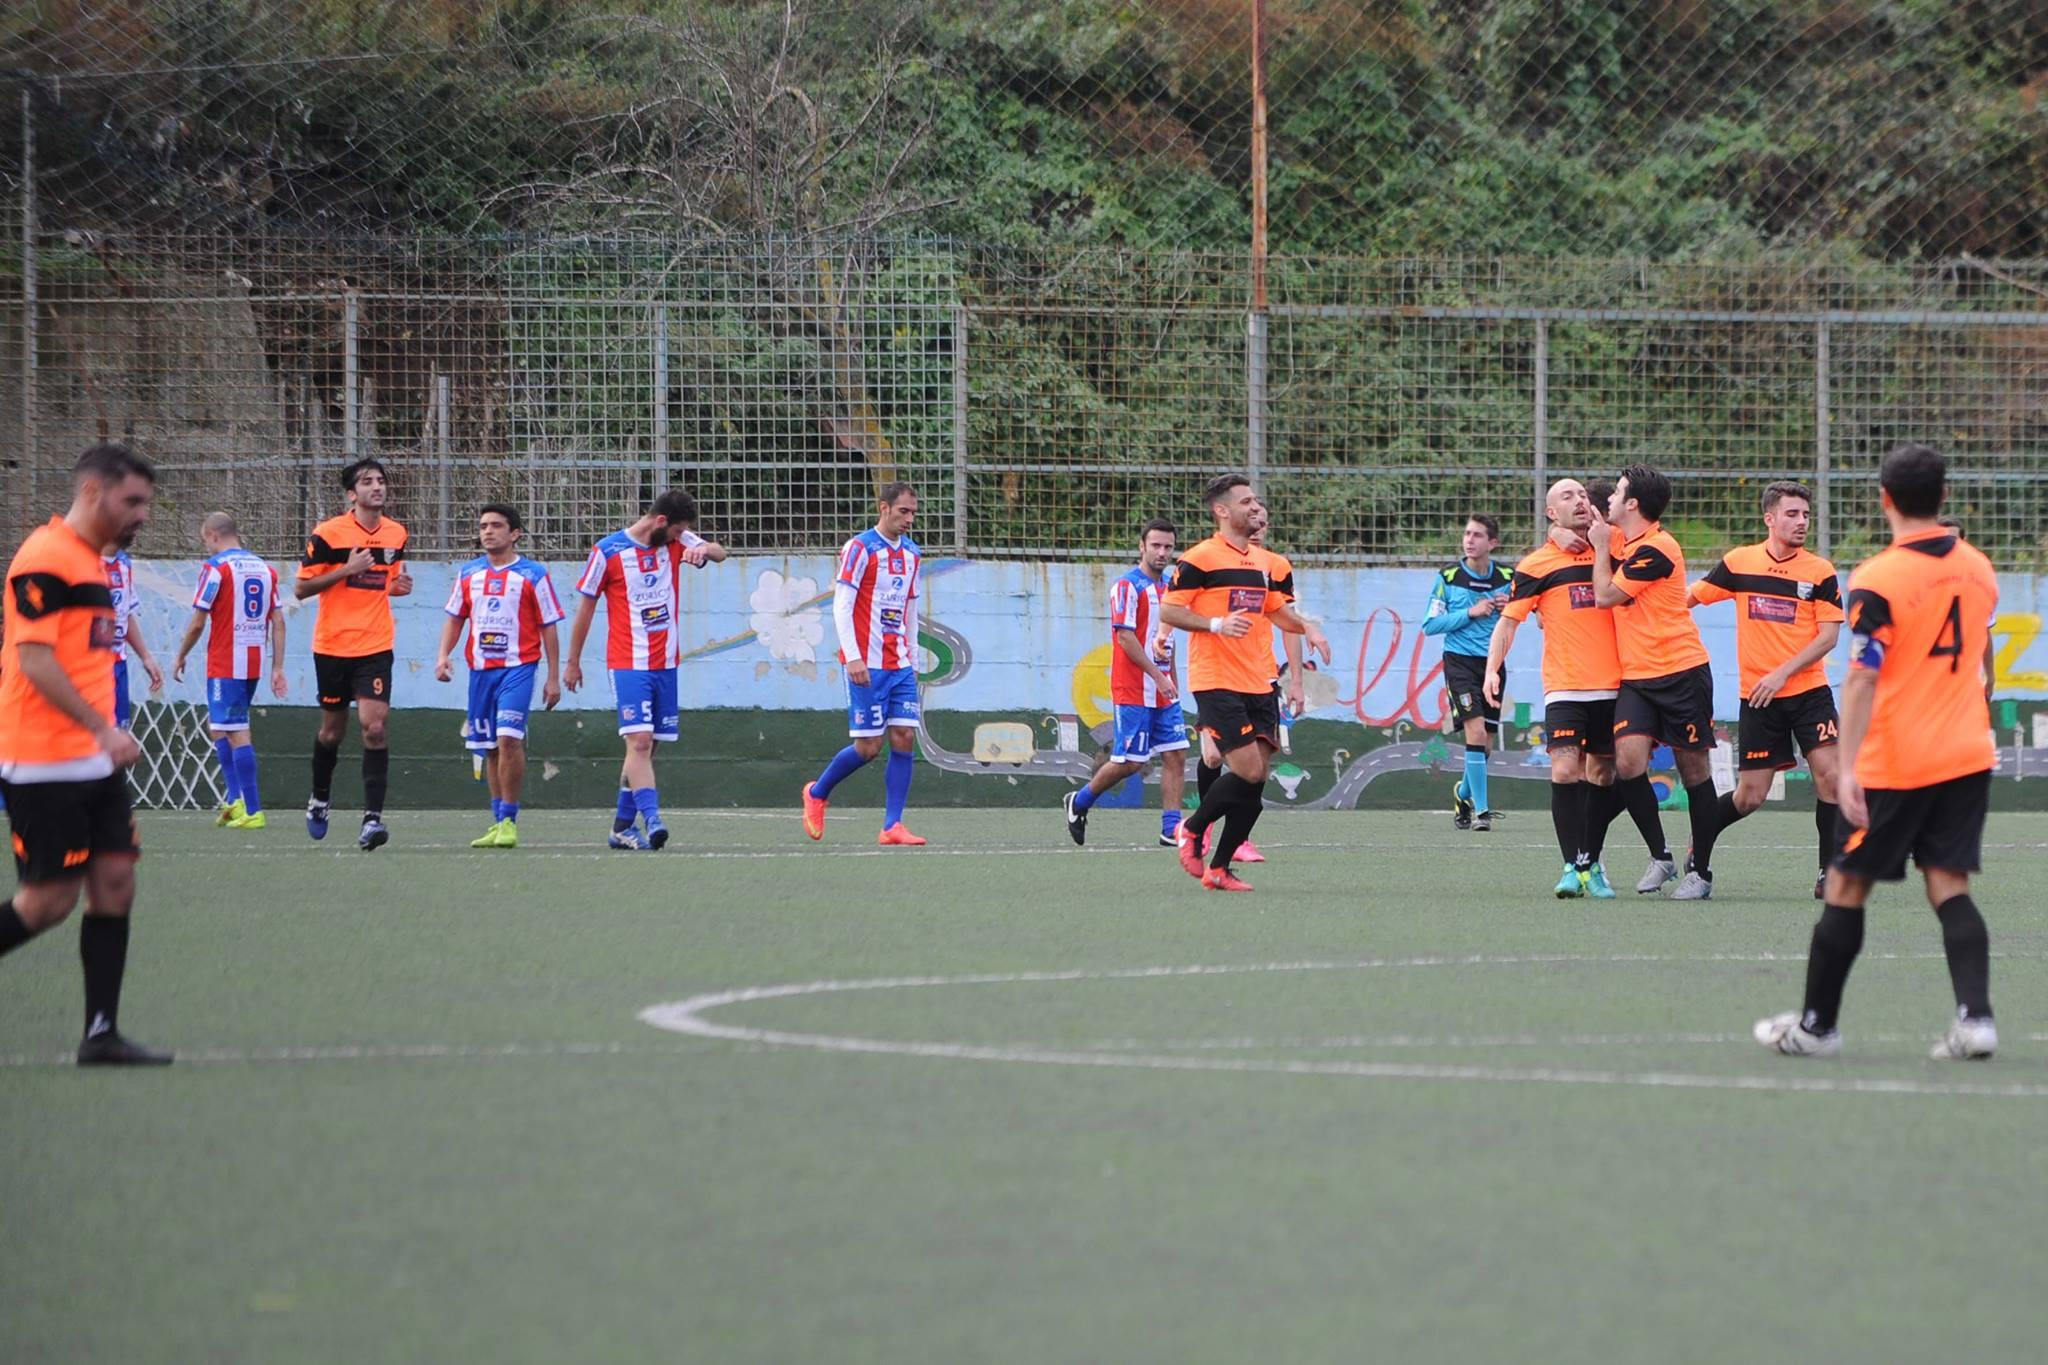 Olympic Salerno - Simone Fierro 2-2